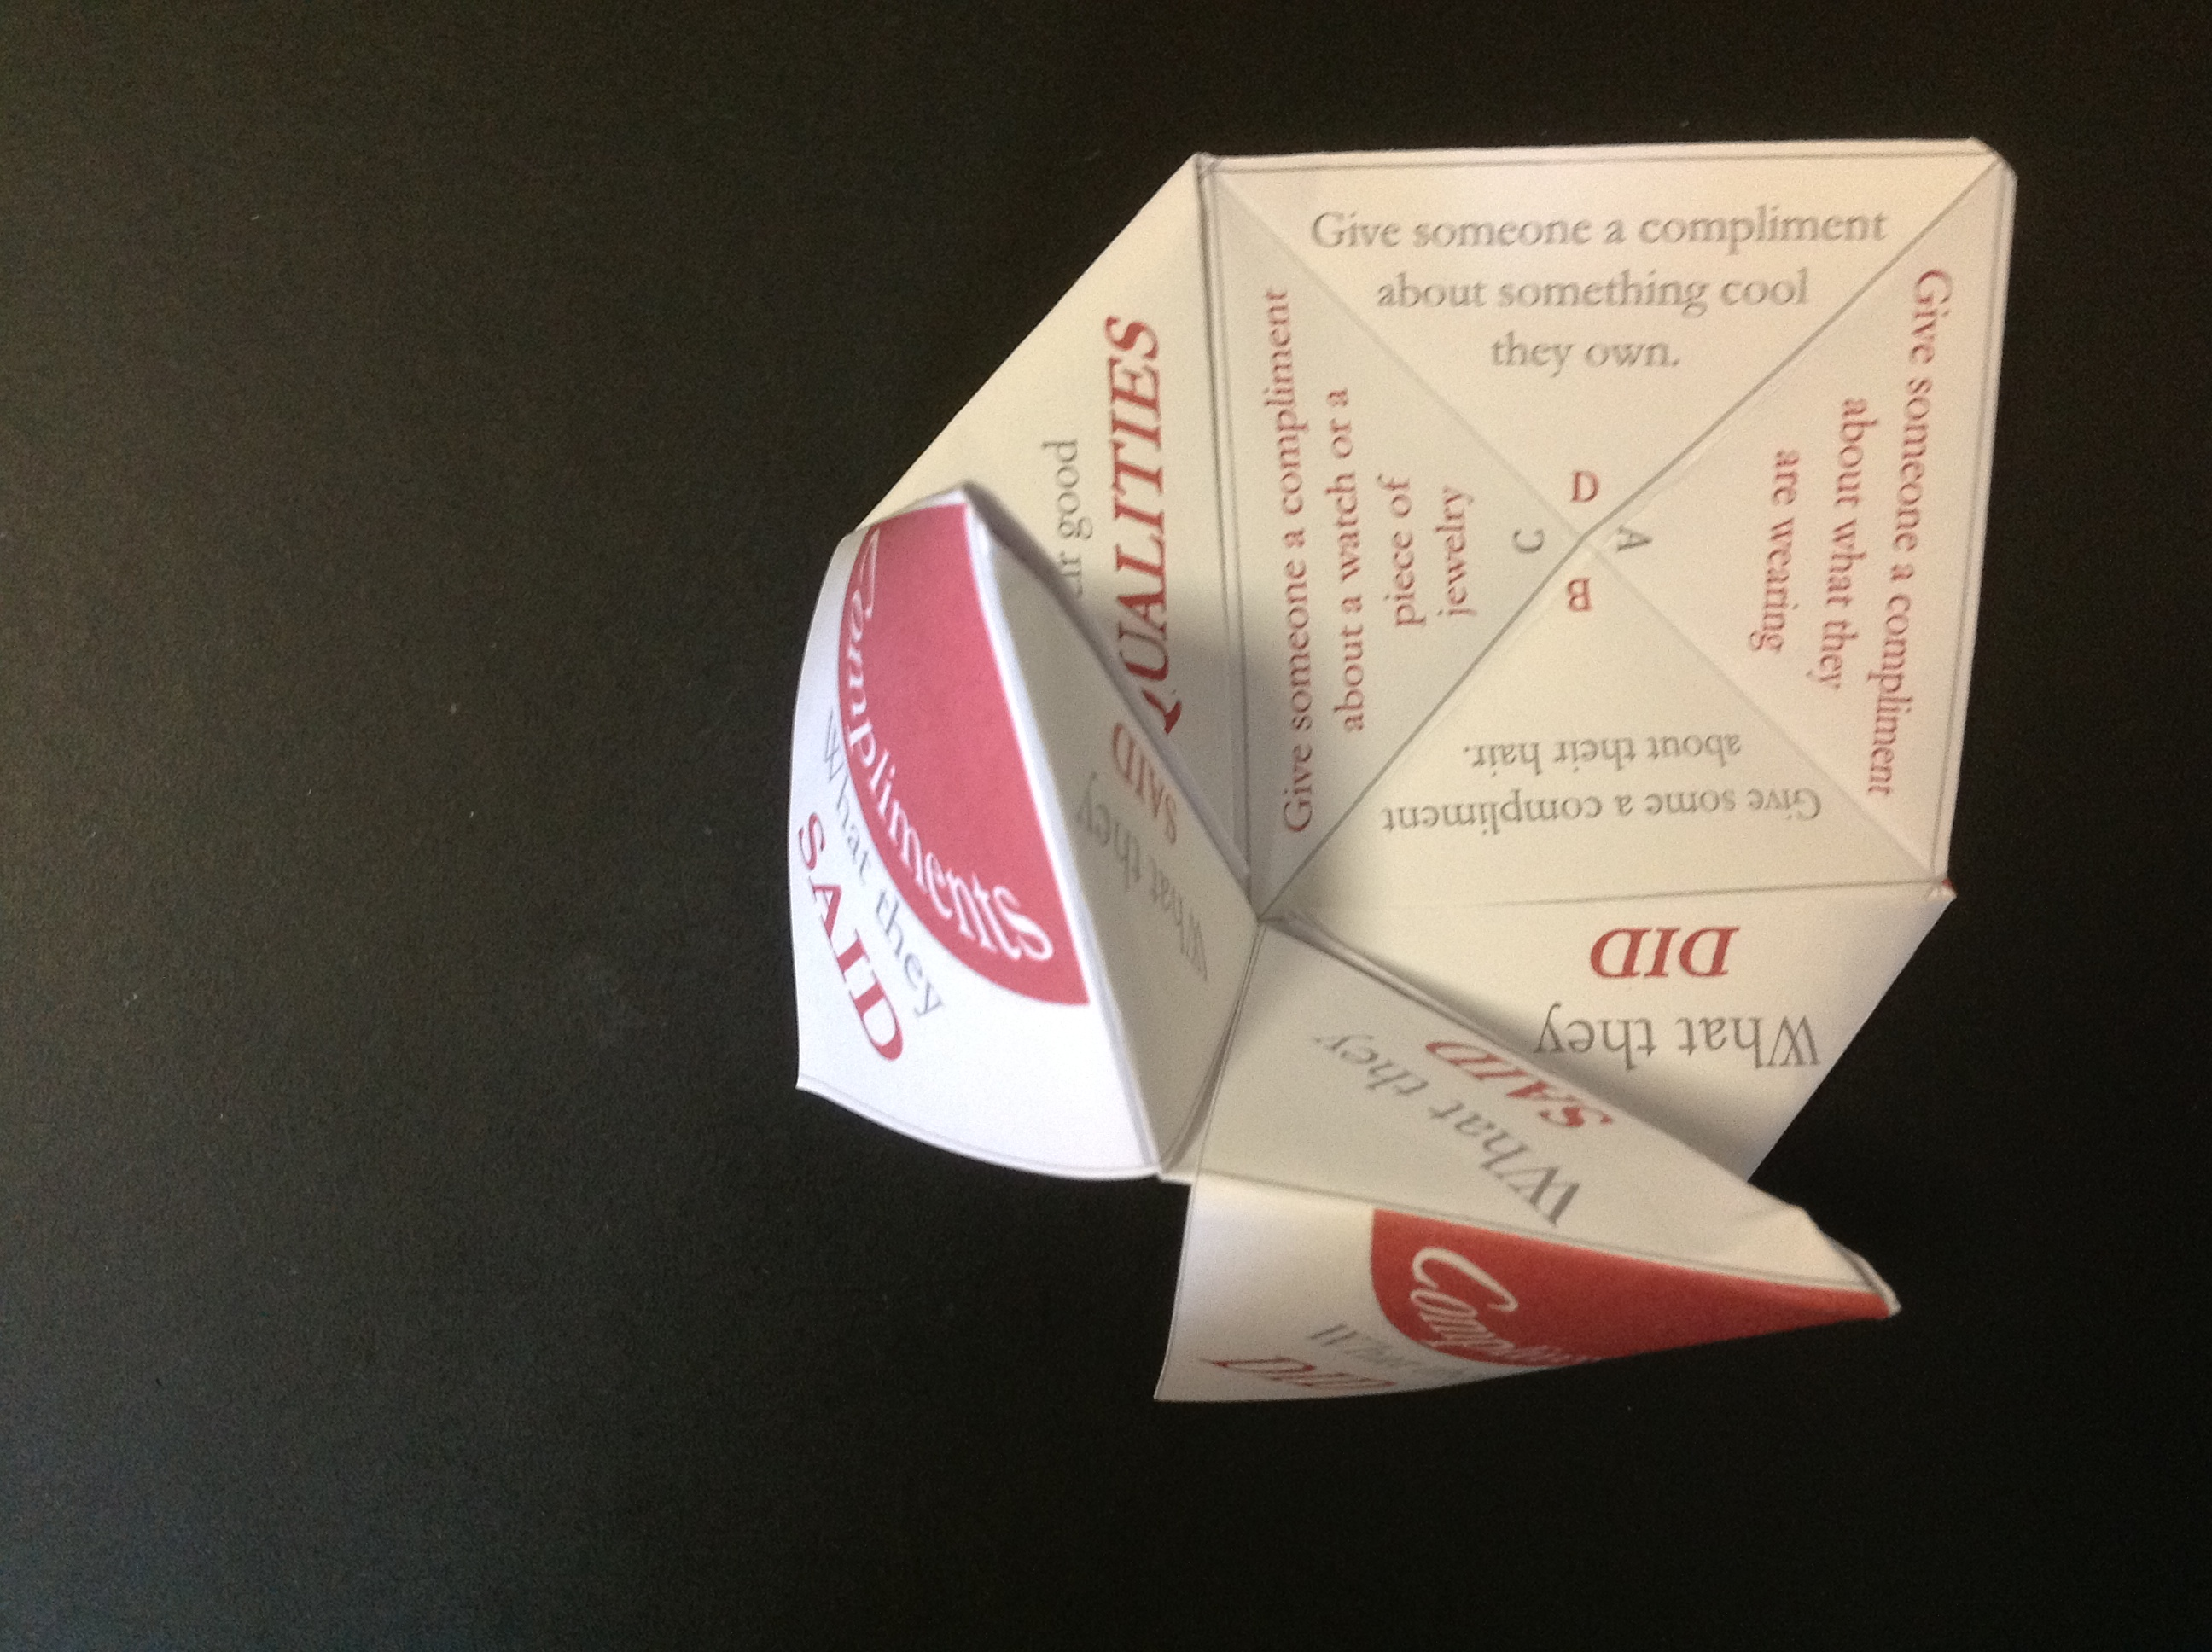 Paper Fortune Tellers – social skills games for children ... - photo#49